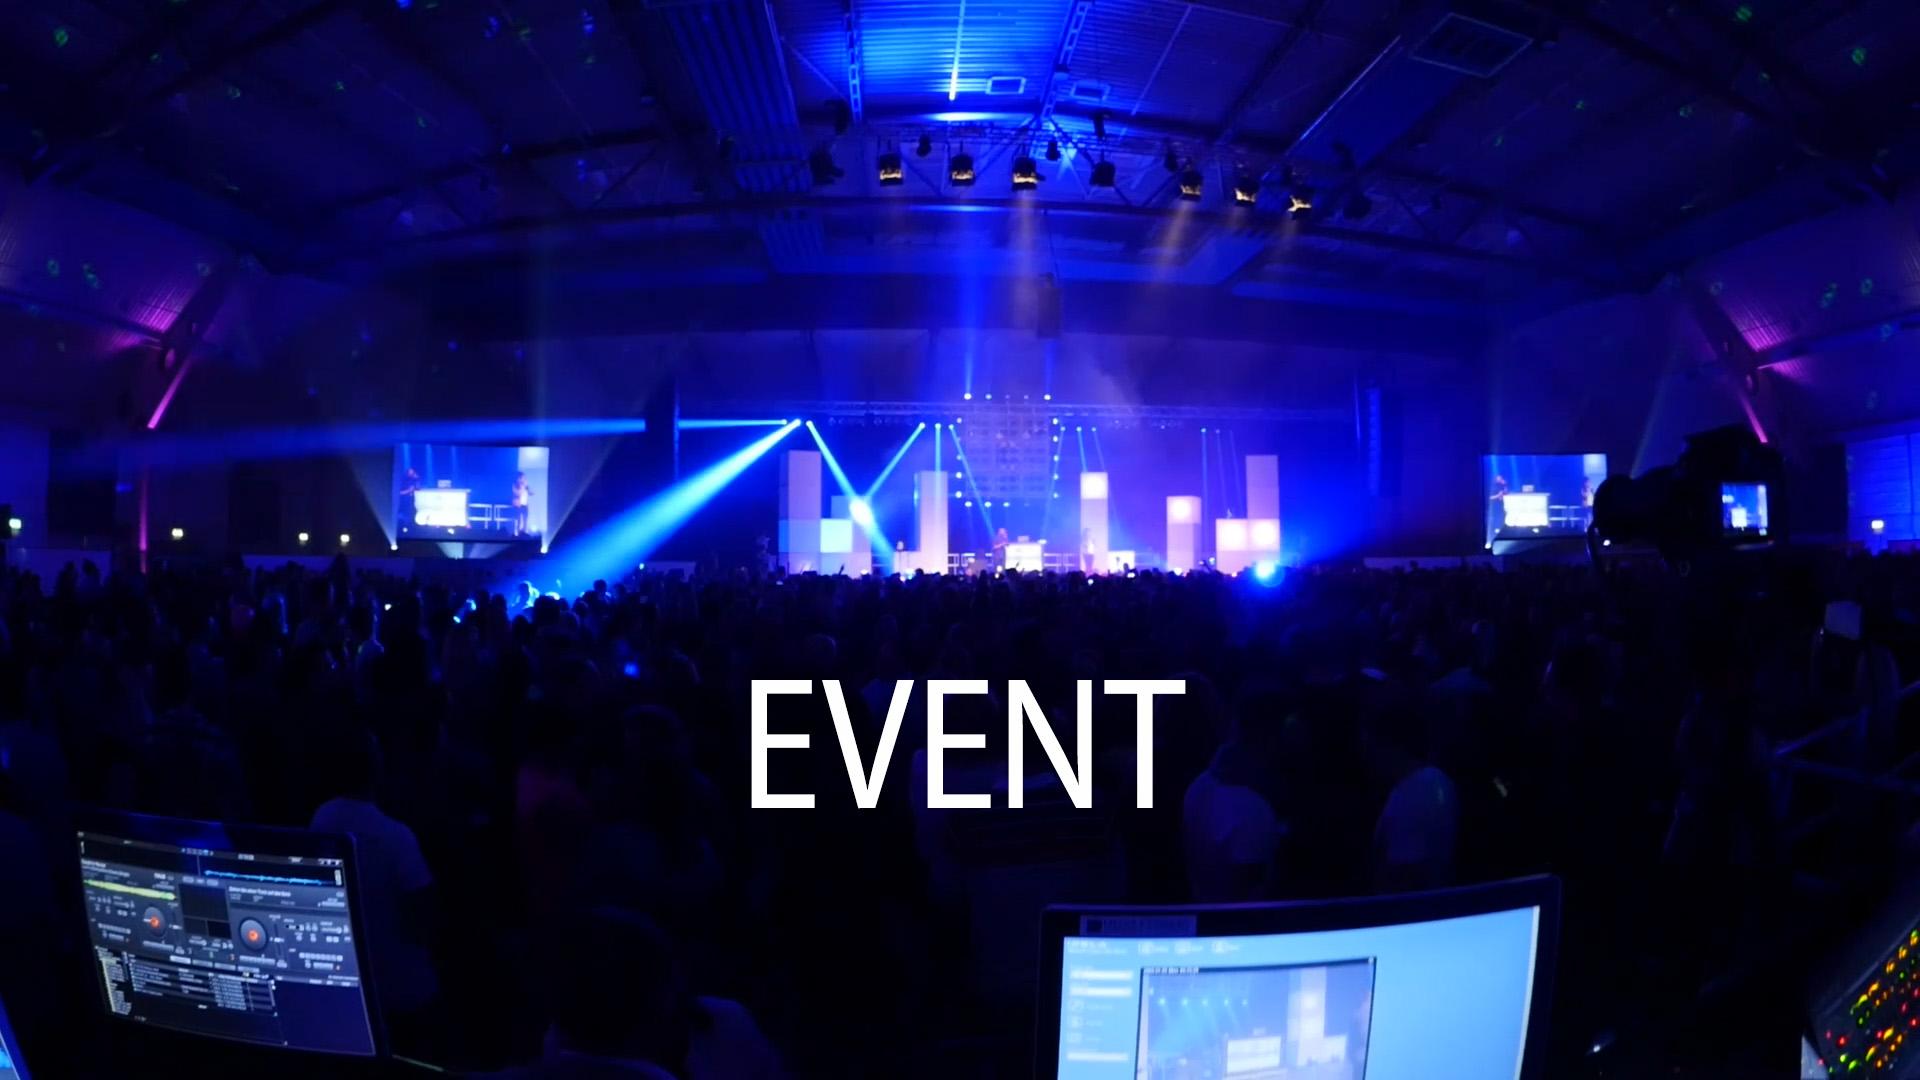 Eventvideos